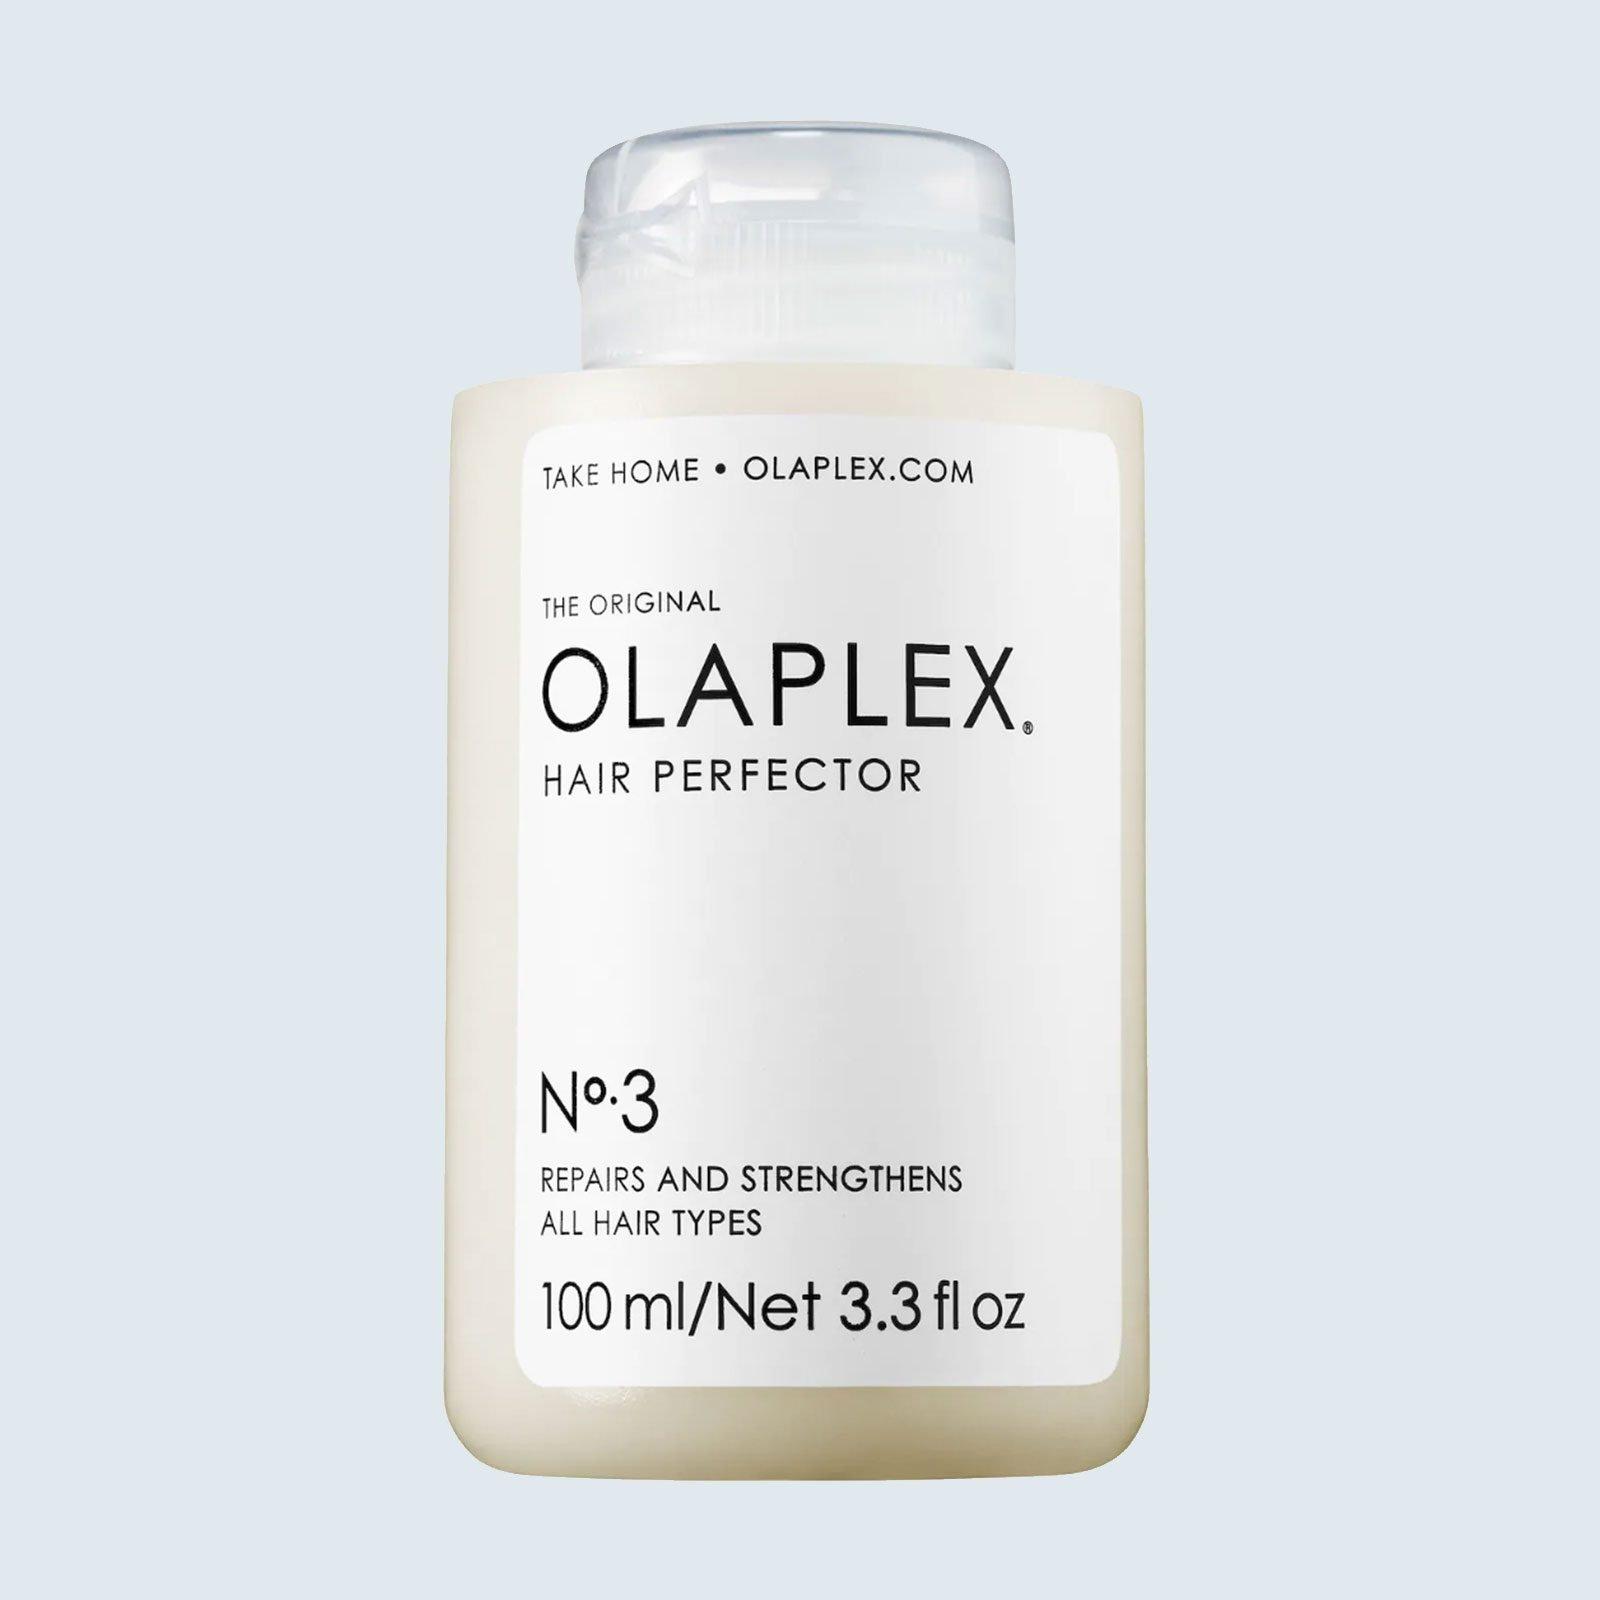 Best conditioning treatment: Olaplex No. 3 Hair Perfector